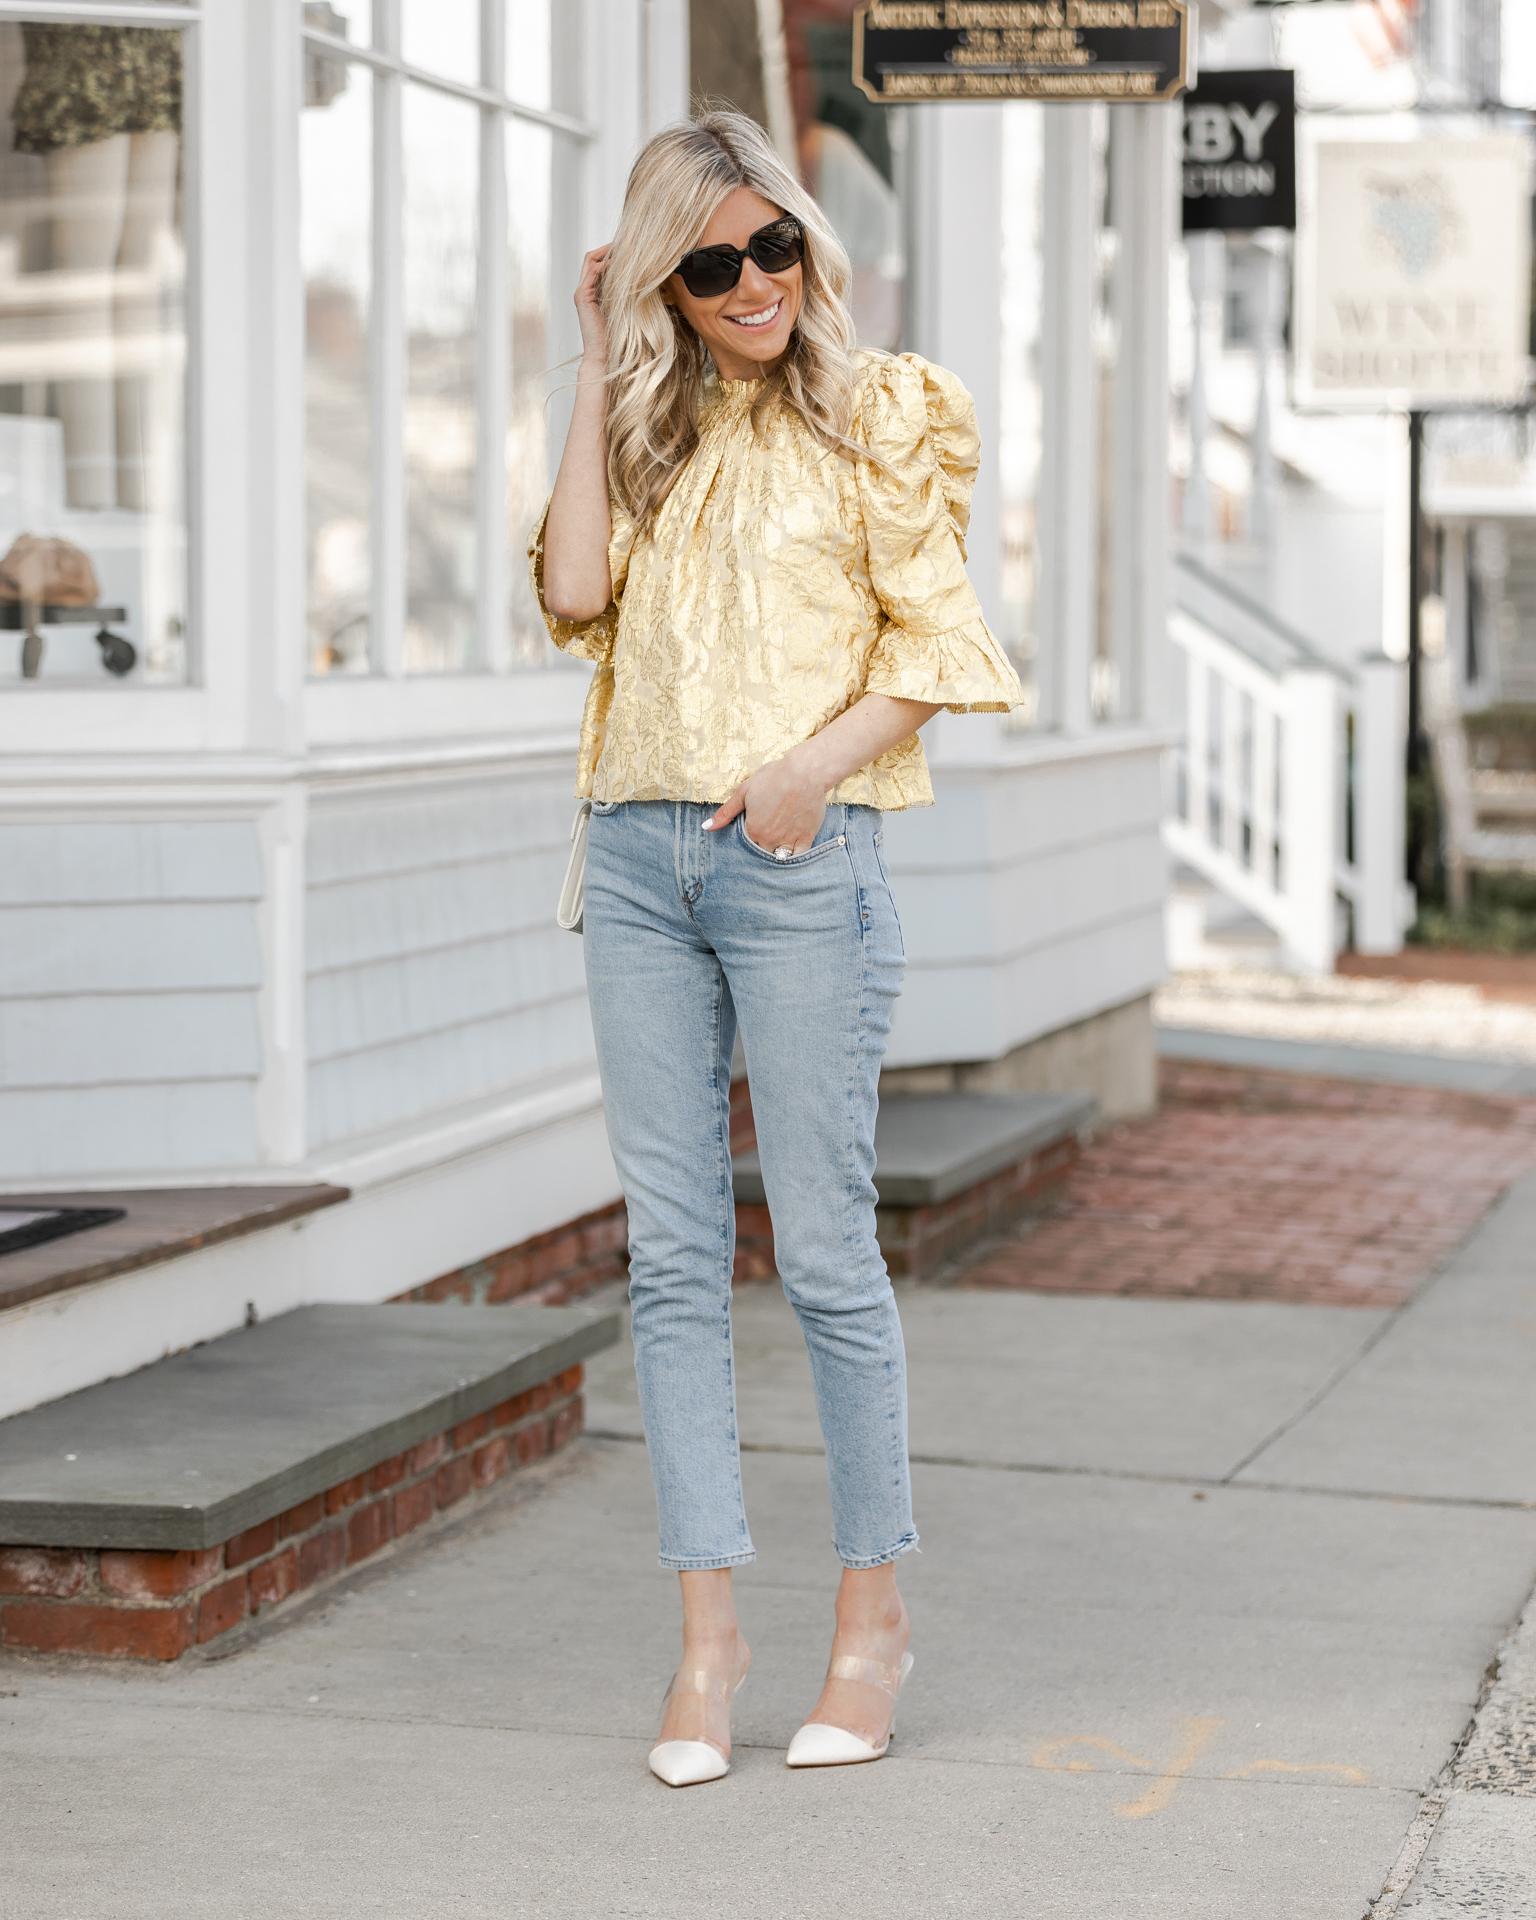 saylor-yellow-metallic-puff-sleeve-top-the-glamorous-gal